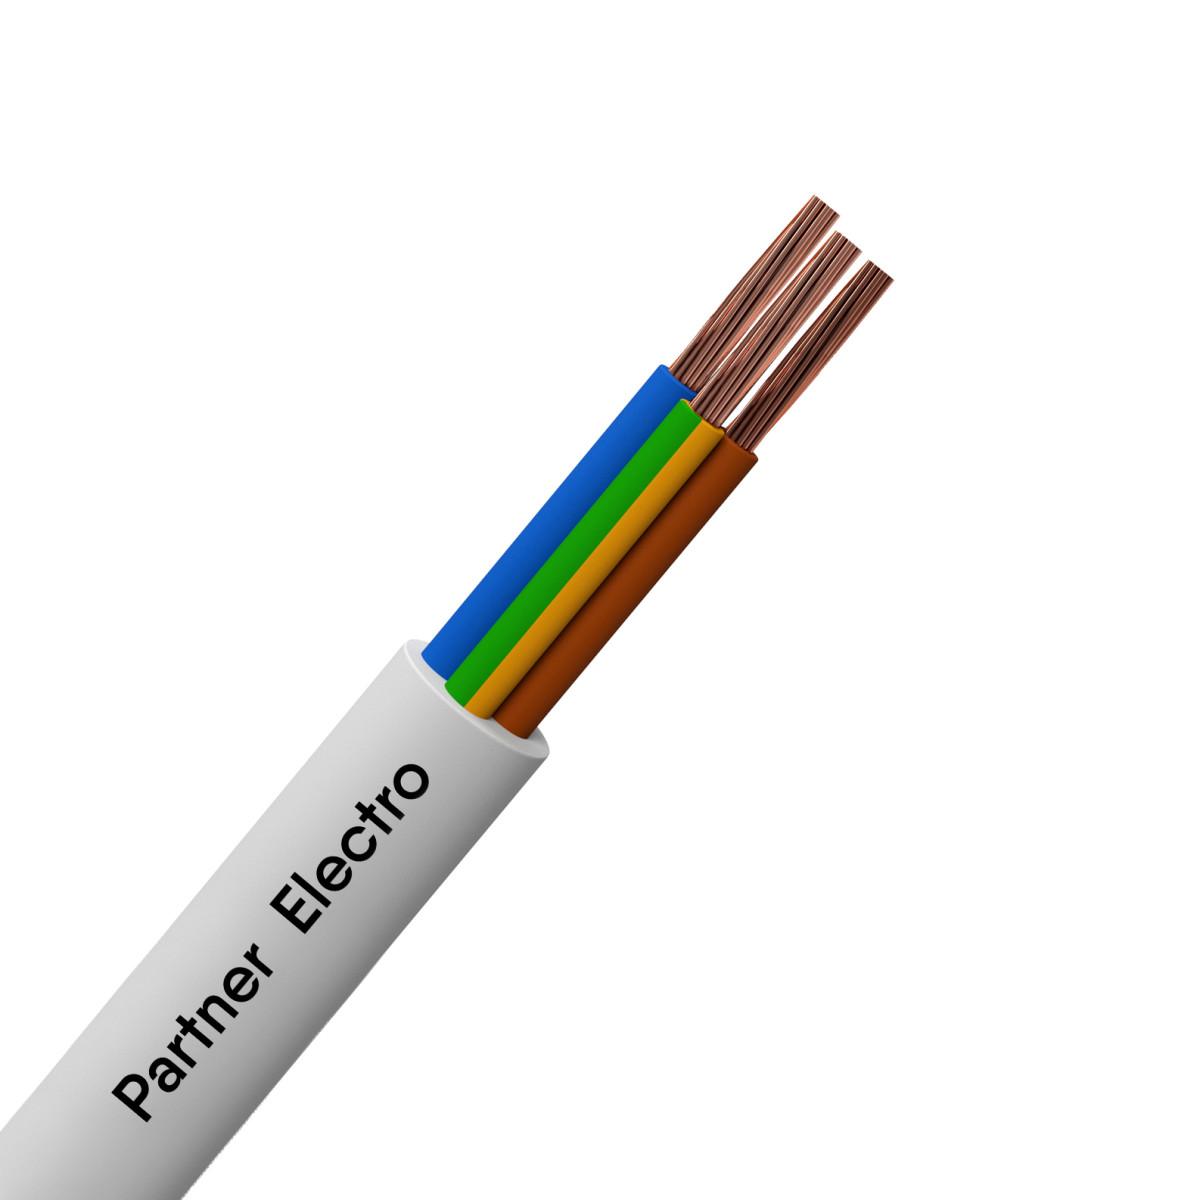 Провод Партнер-Электро ПВС 3x6 на отрез